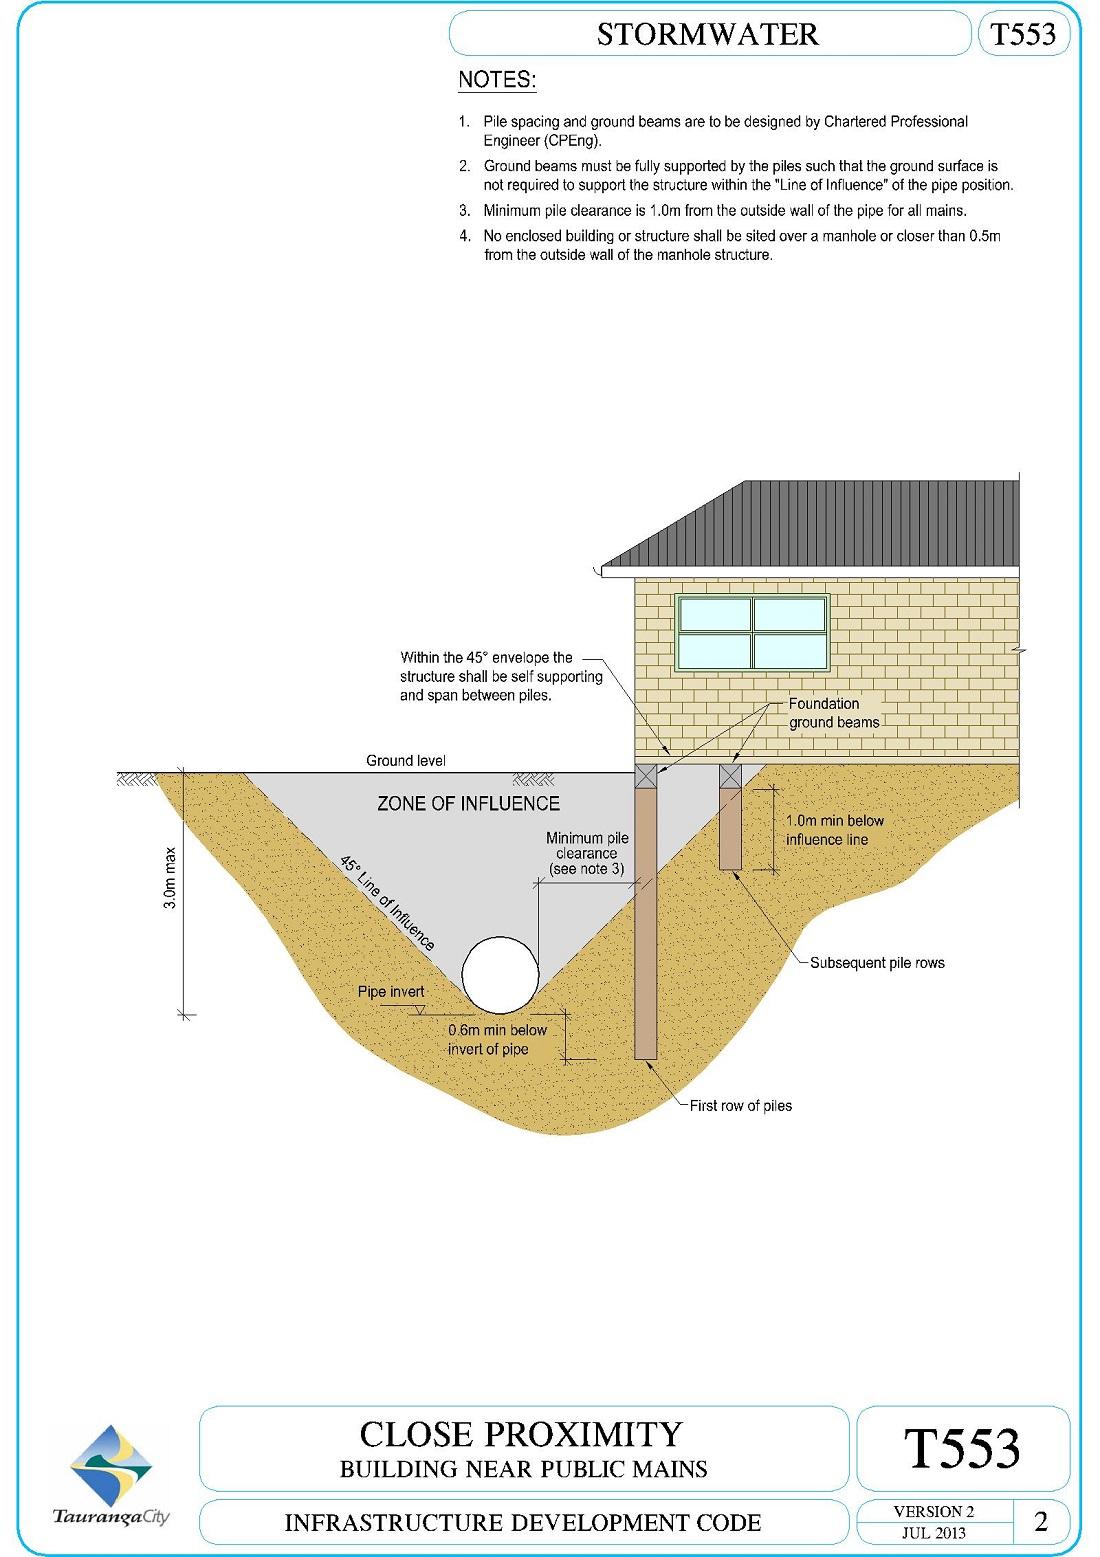 Close Proximity - Building Near Public Mains